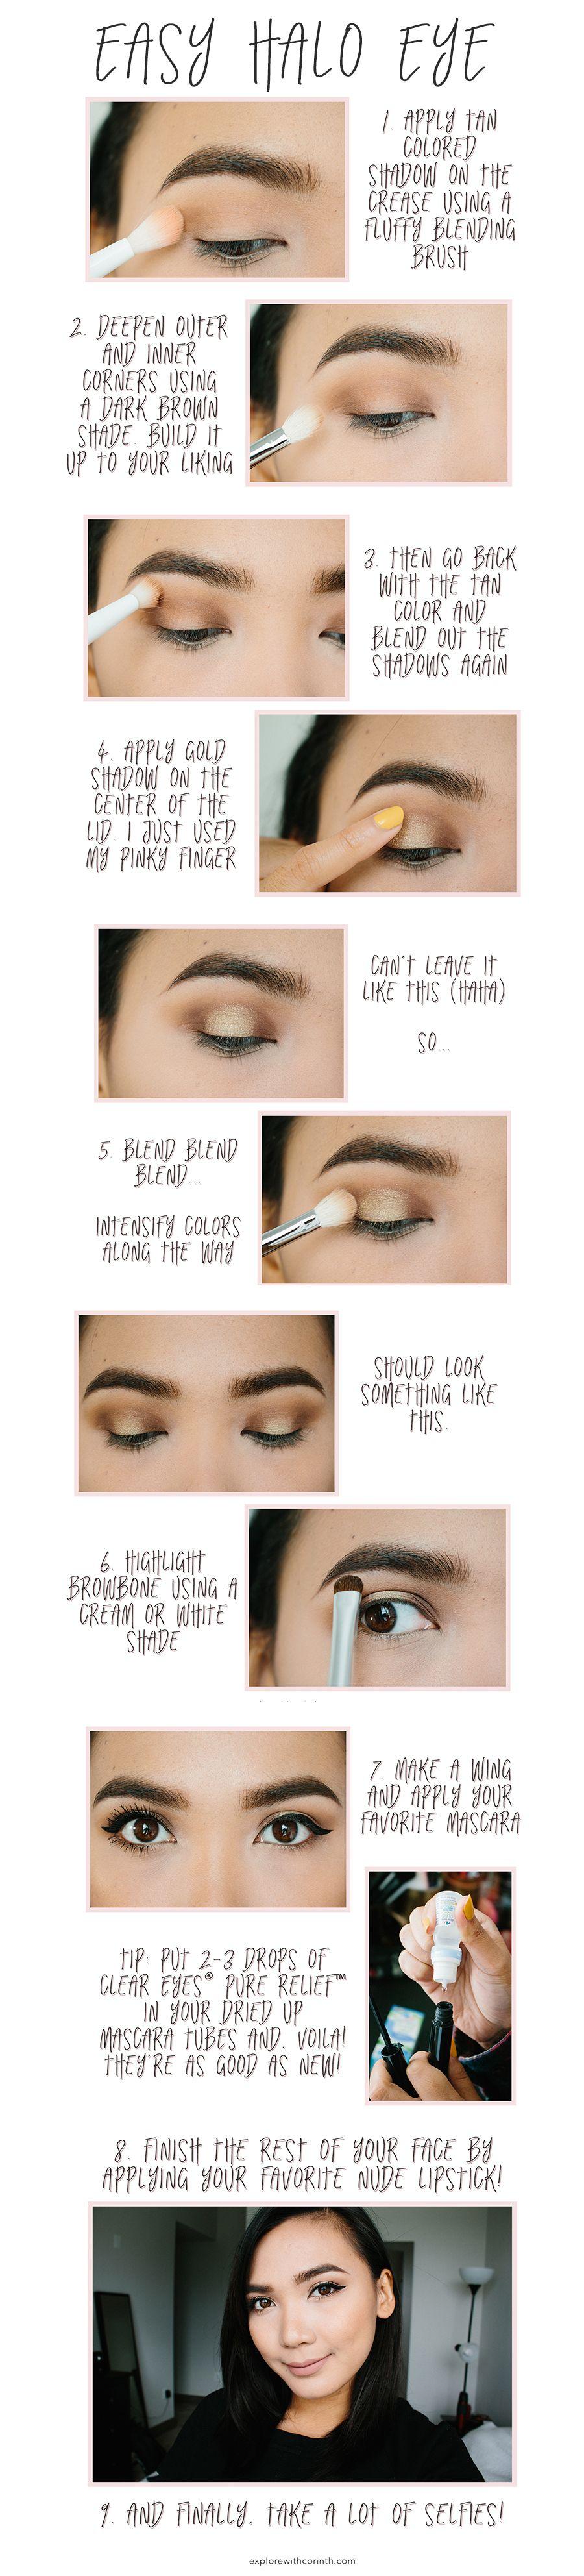 Pin by Melissa Sabol on eye shadows   Halo eye makeup, Eye